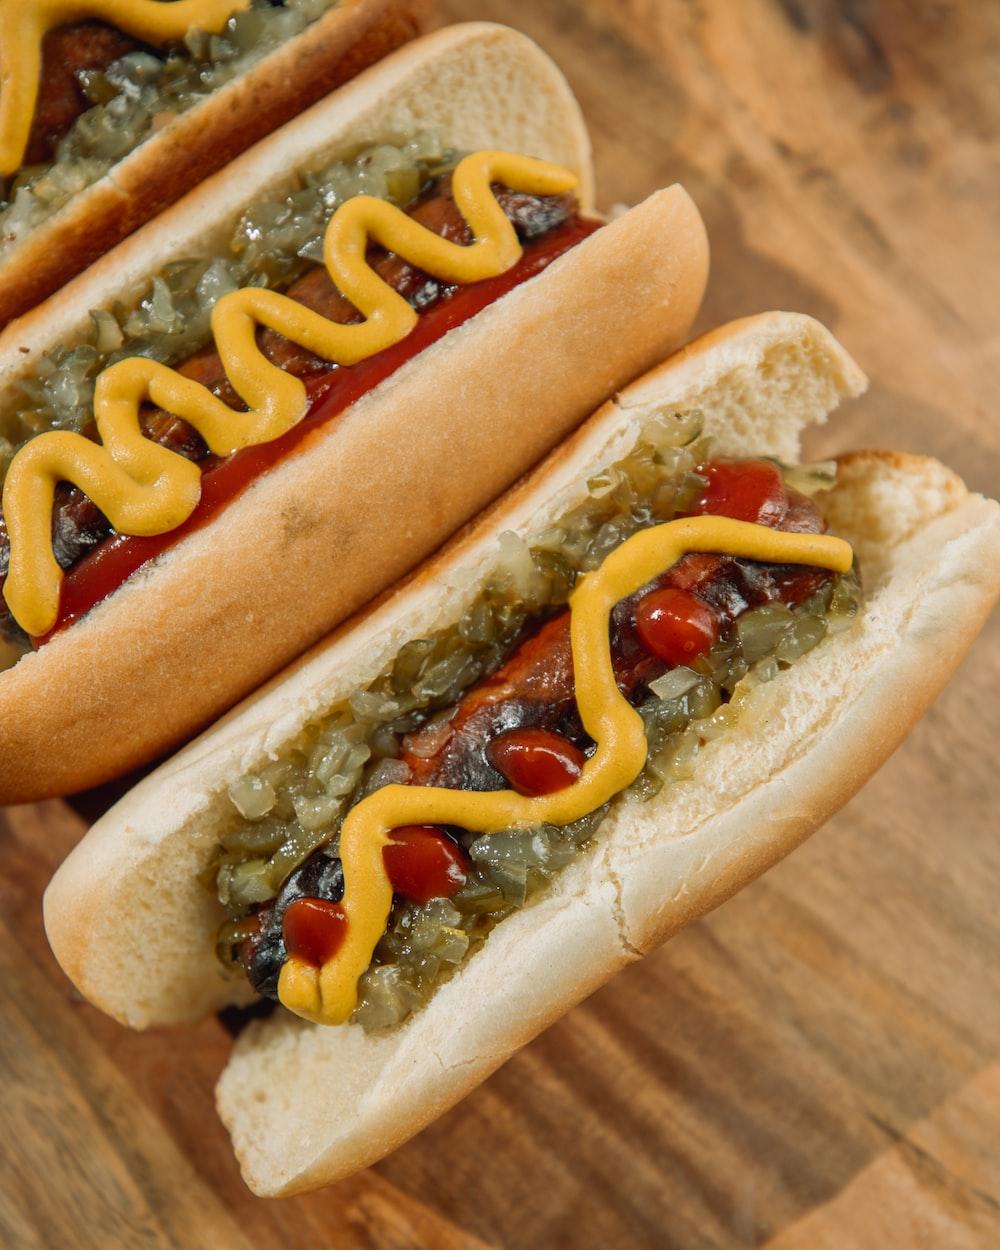 hotdog sandwich with mustard and ketchup